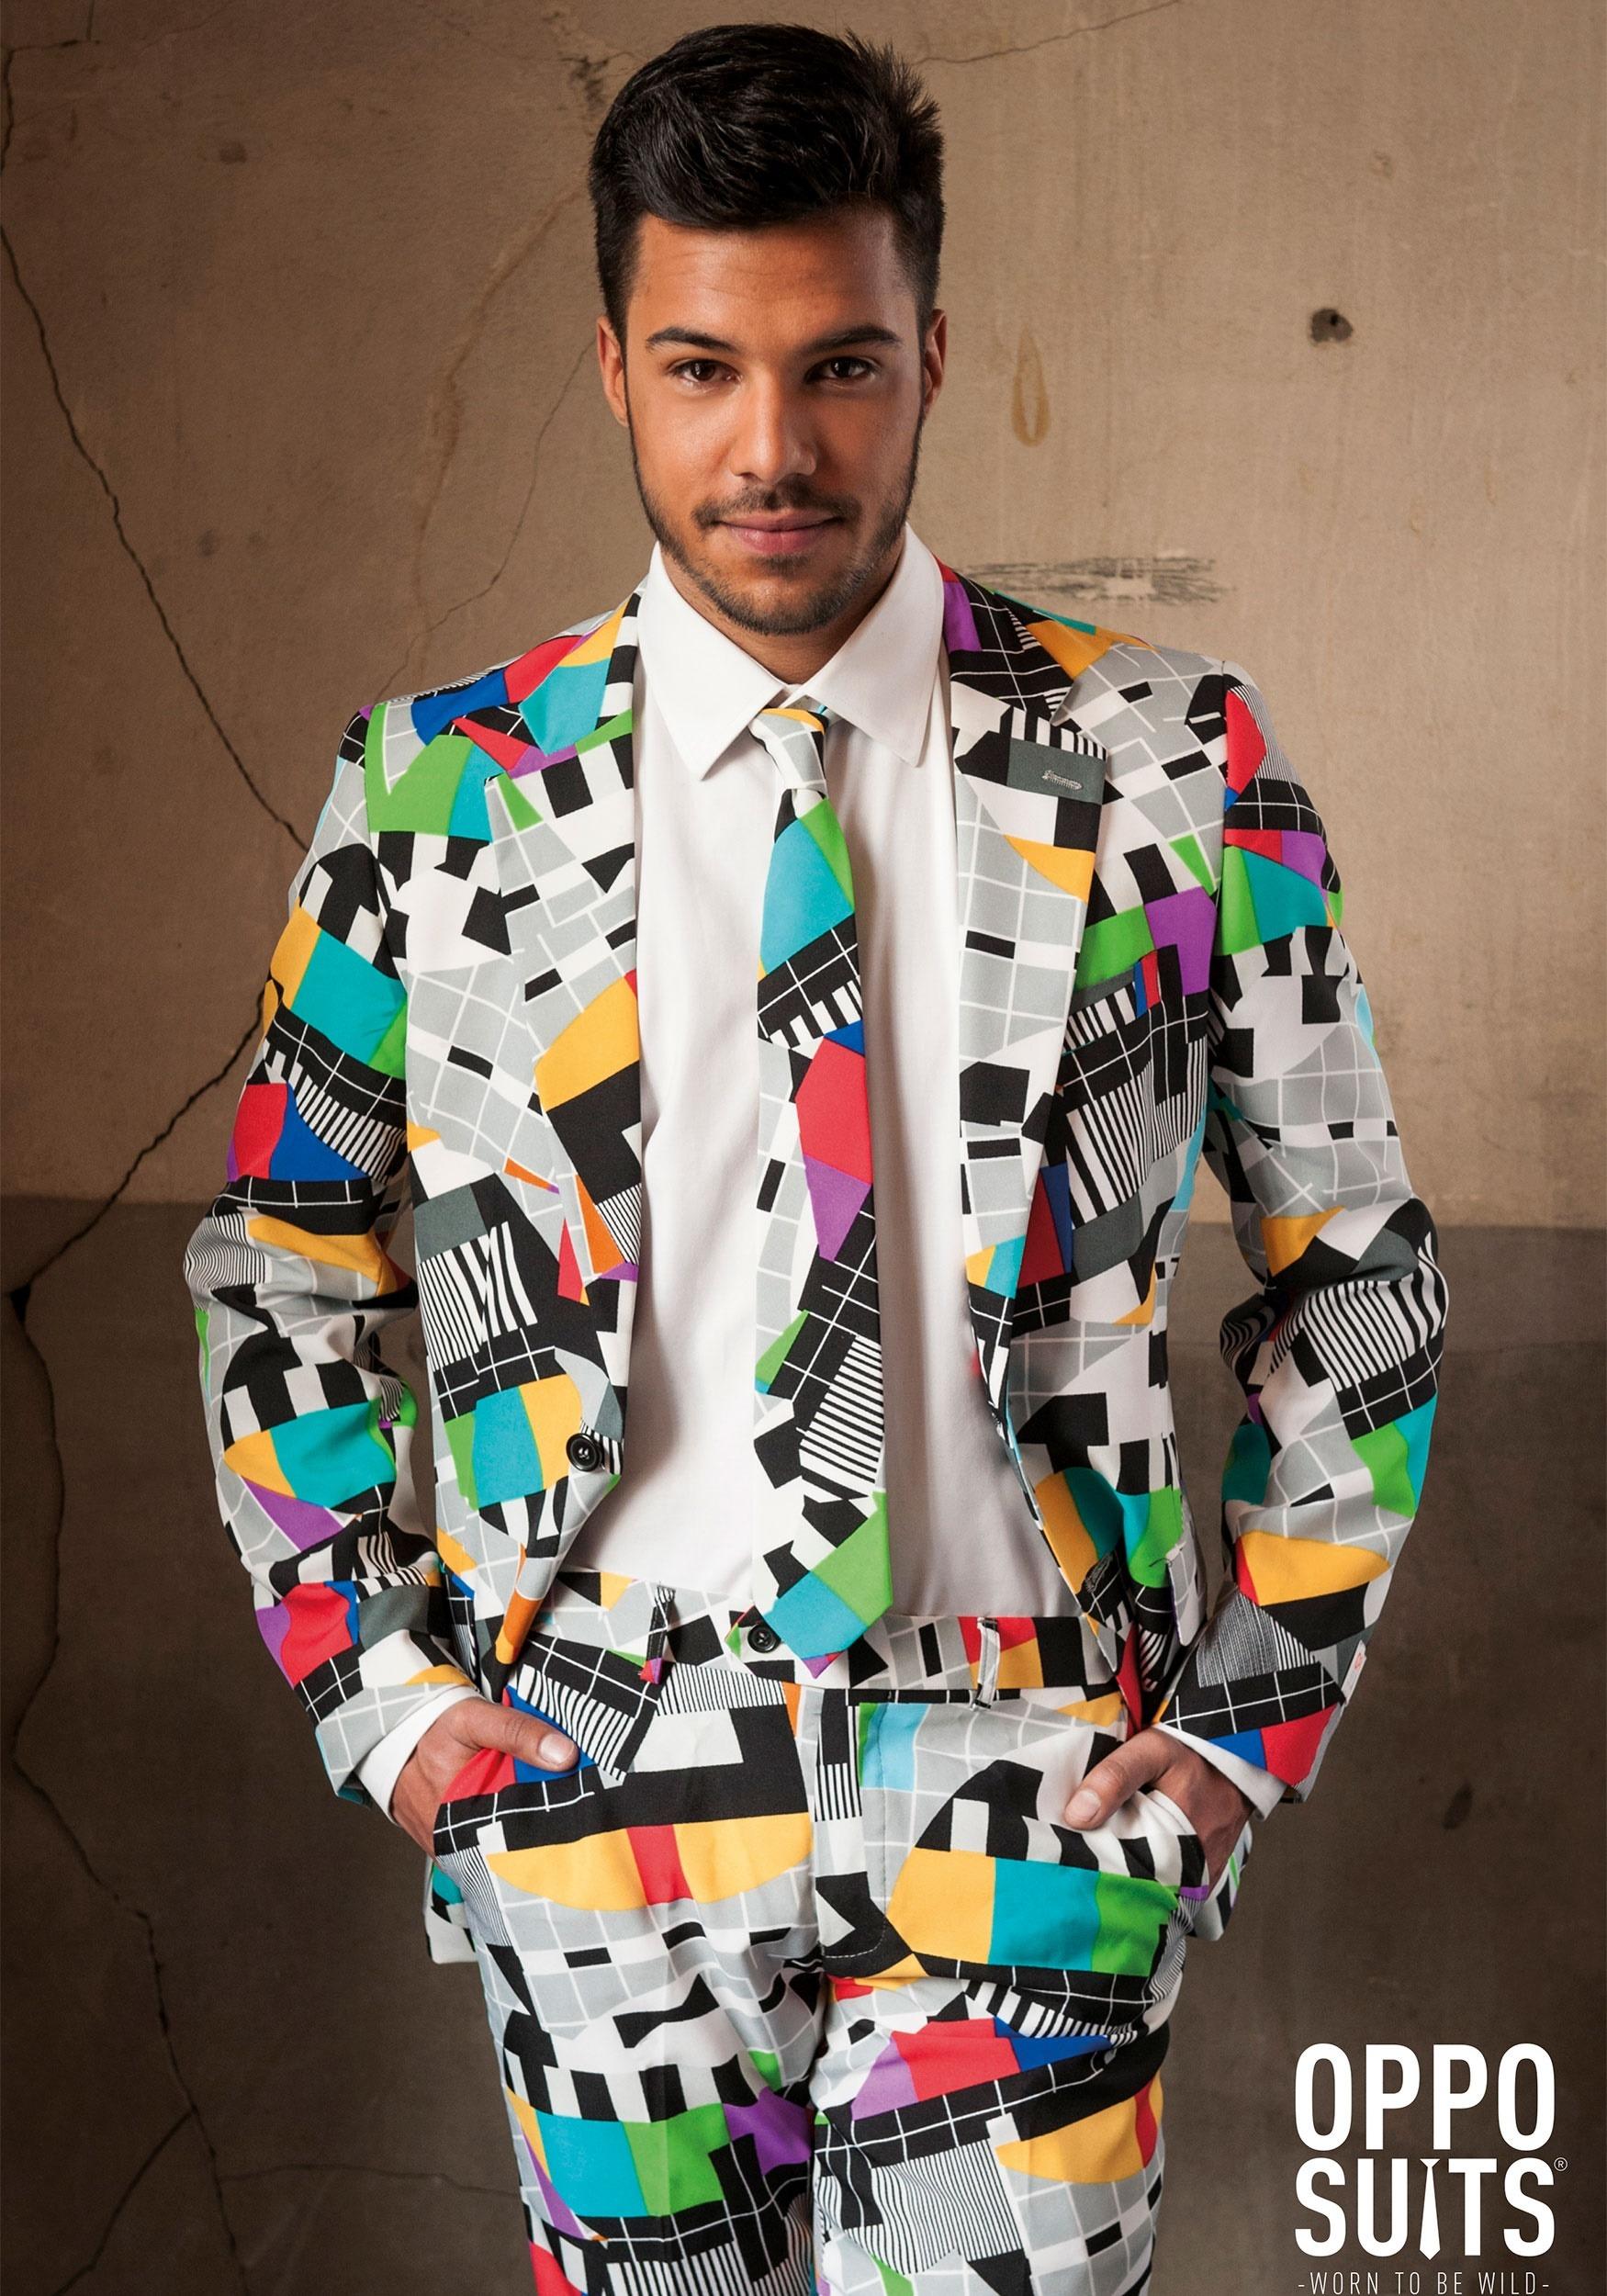 OppoSuits Testival Suit for Men